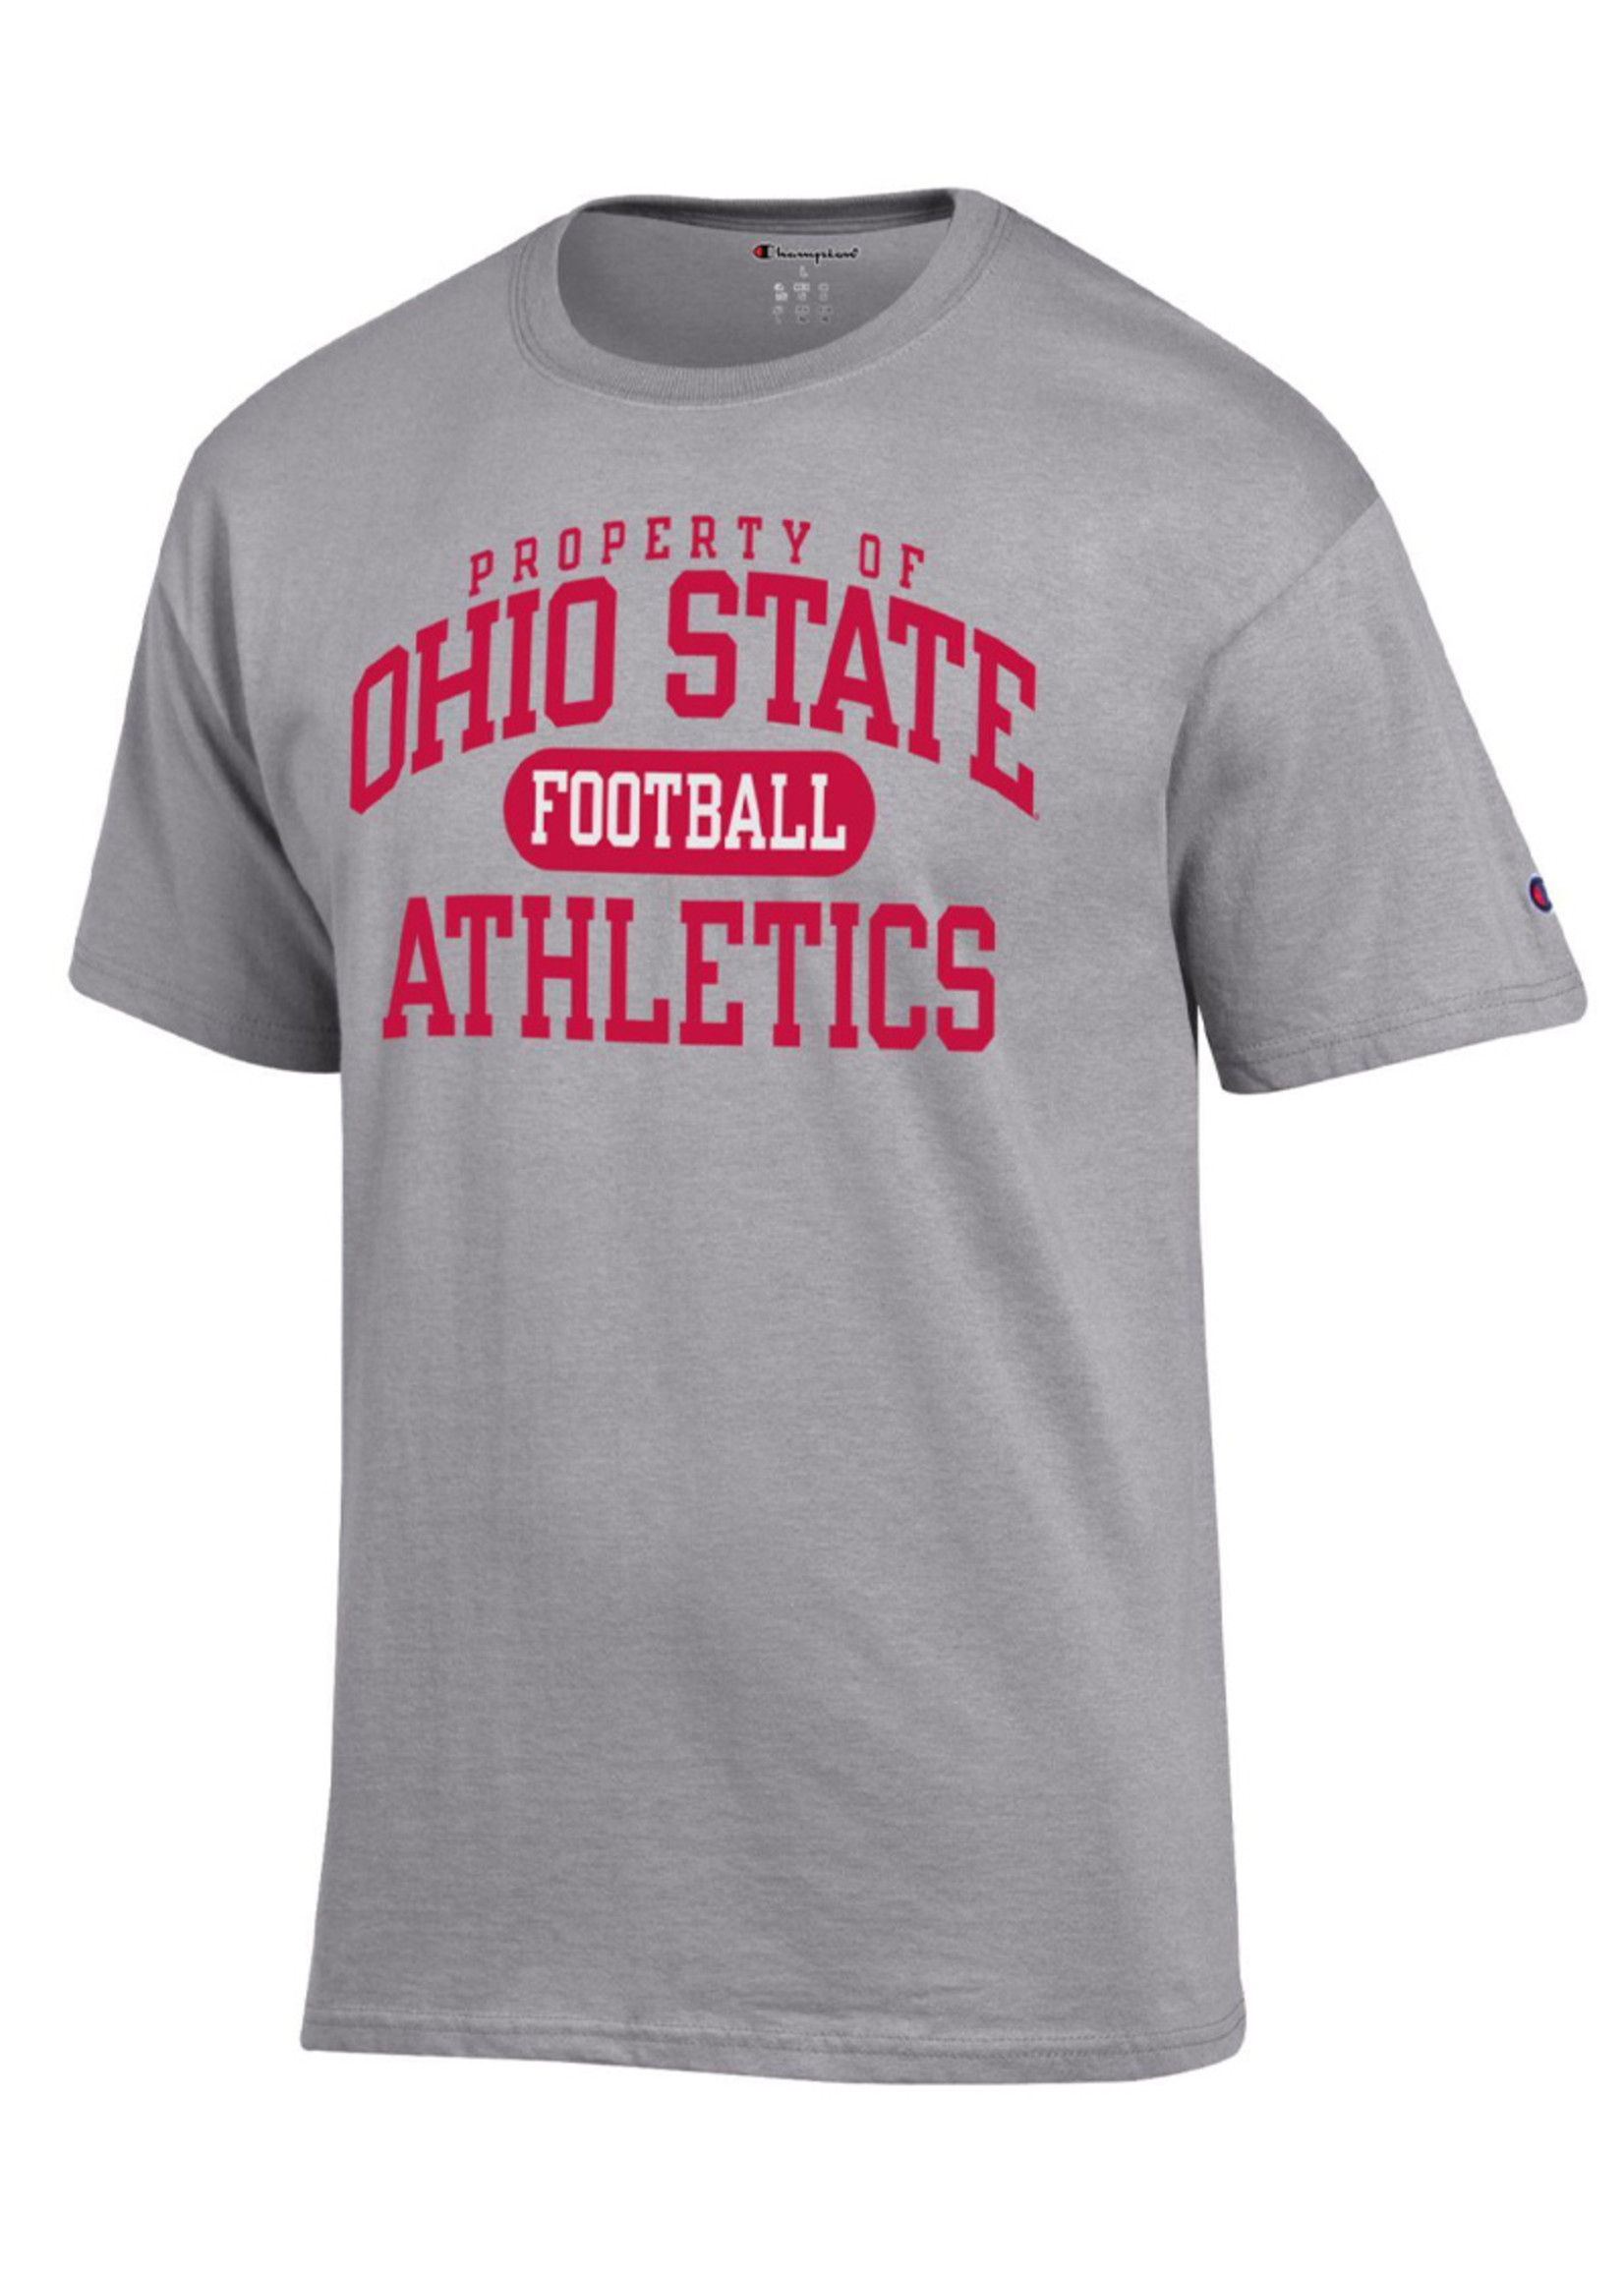 Champion Ohio State University Property of Football Tee